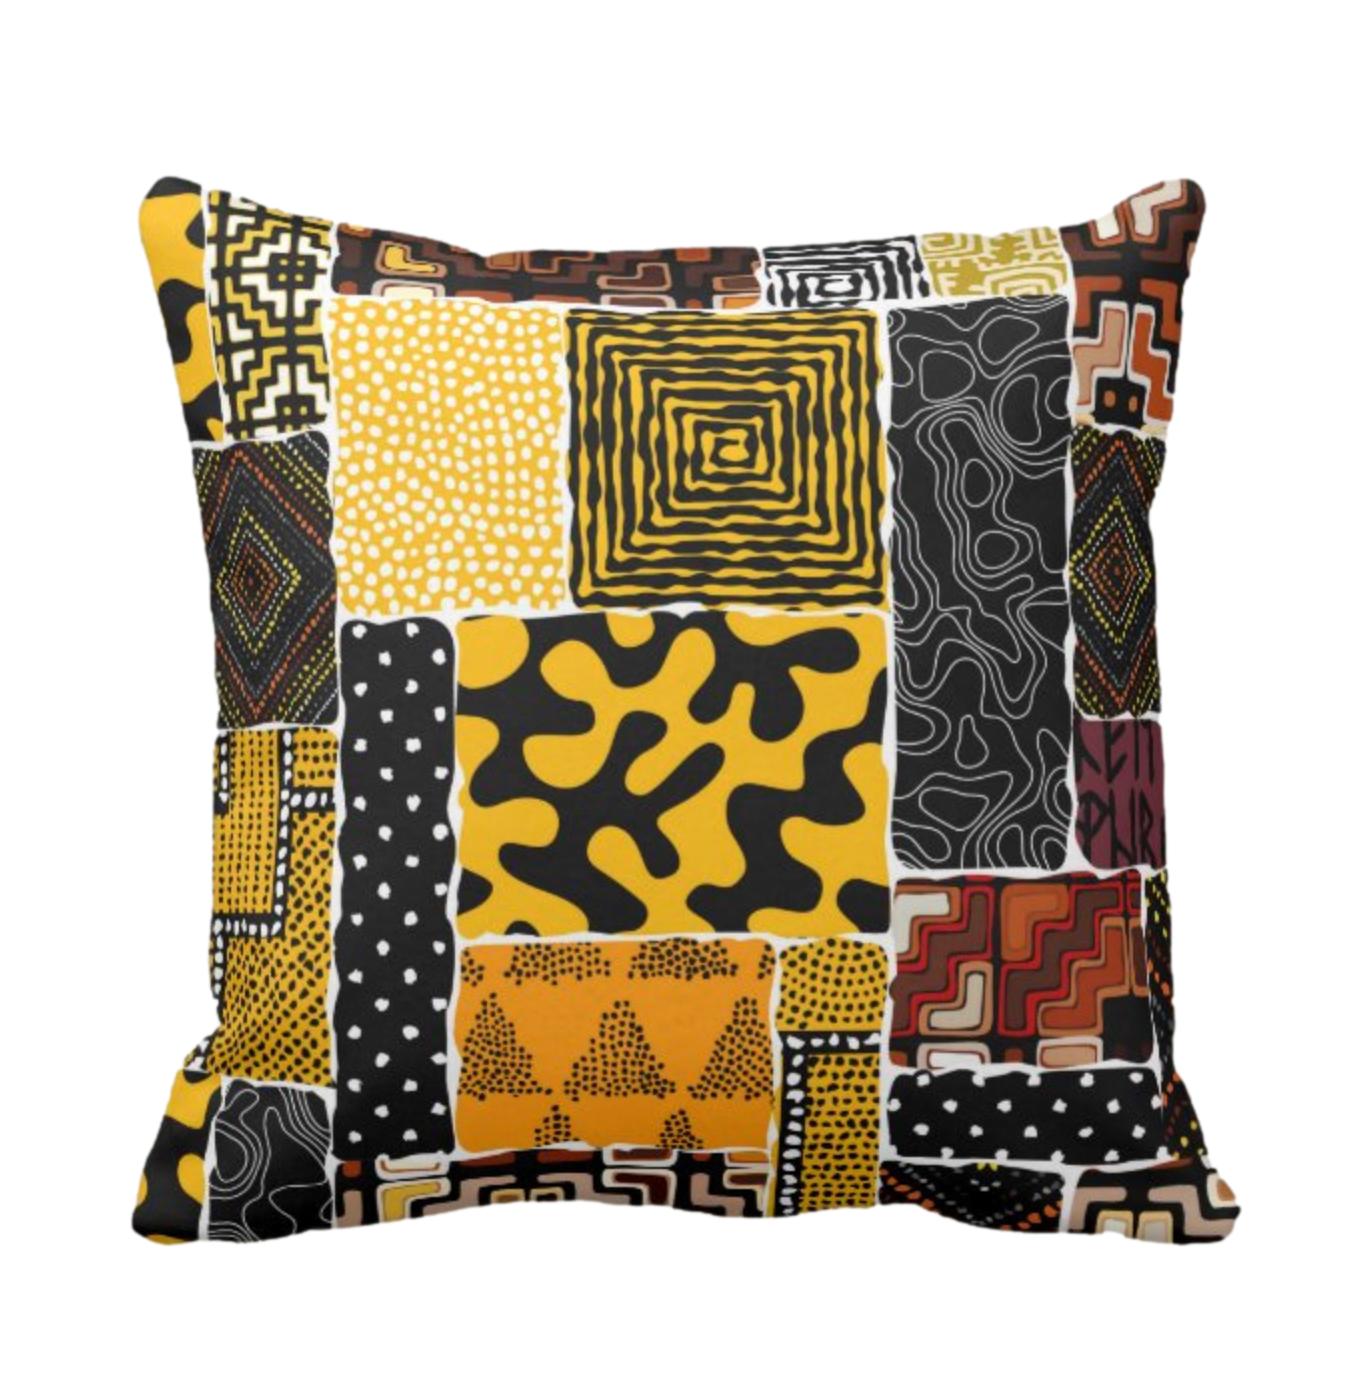 Afro Patchwork Print Design 8 Throw Cushion